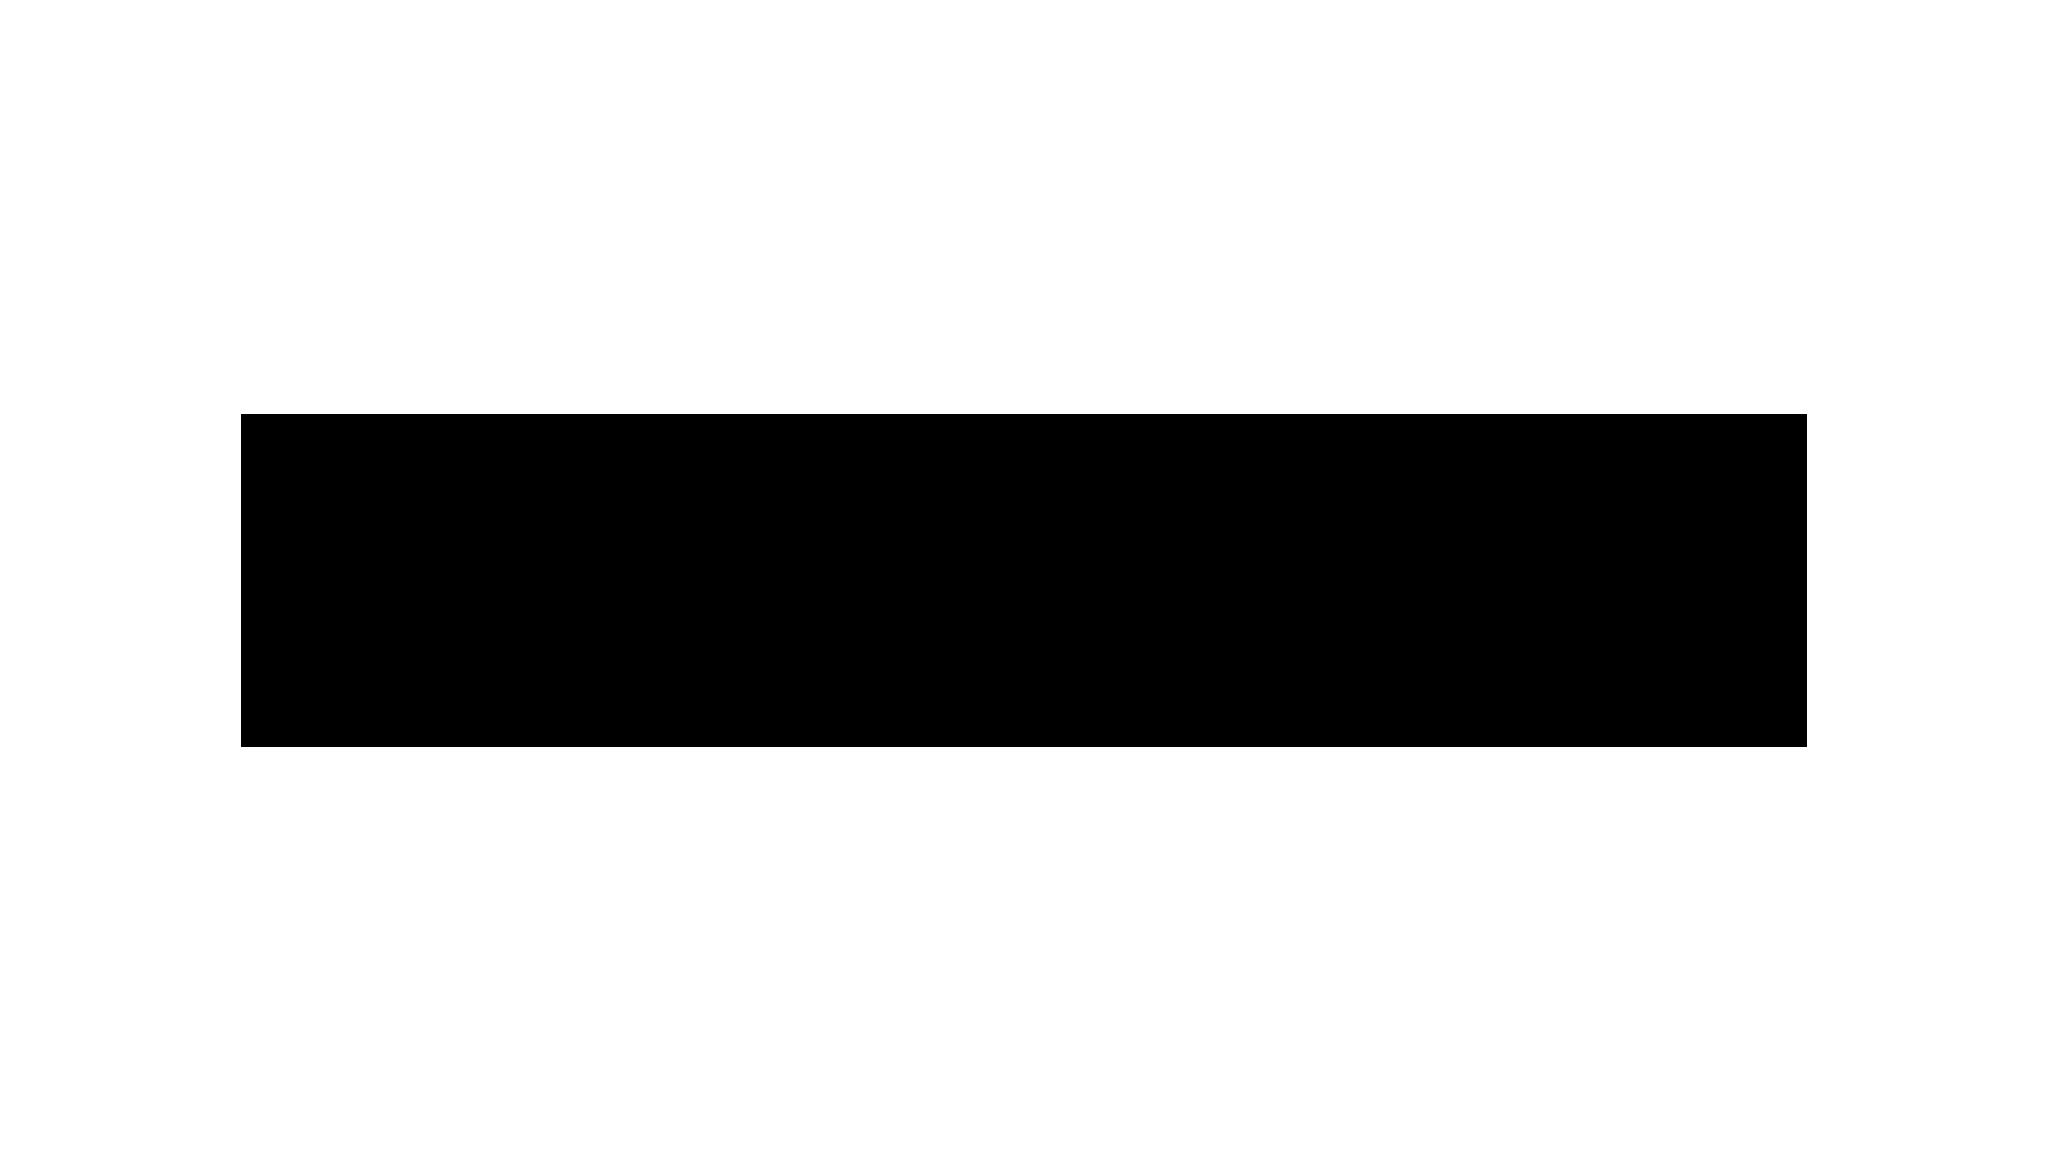 Logo retorio SaaS startup